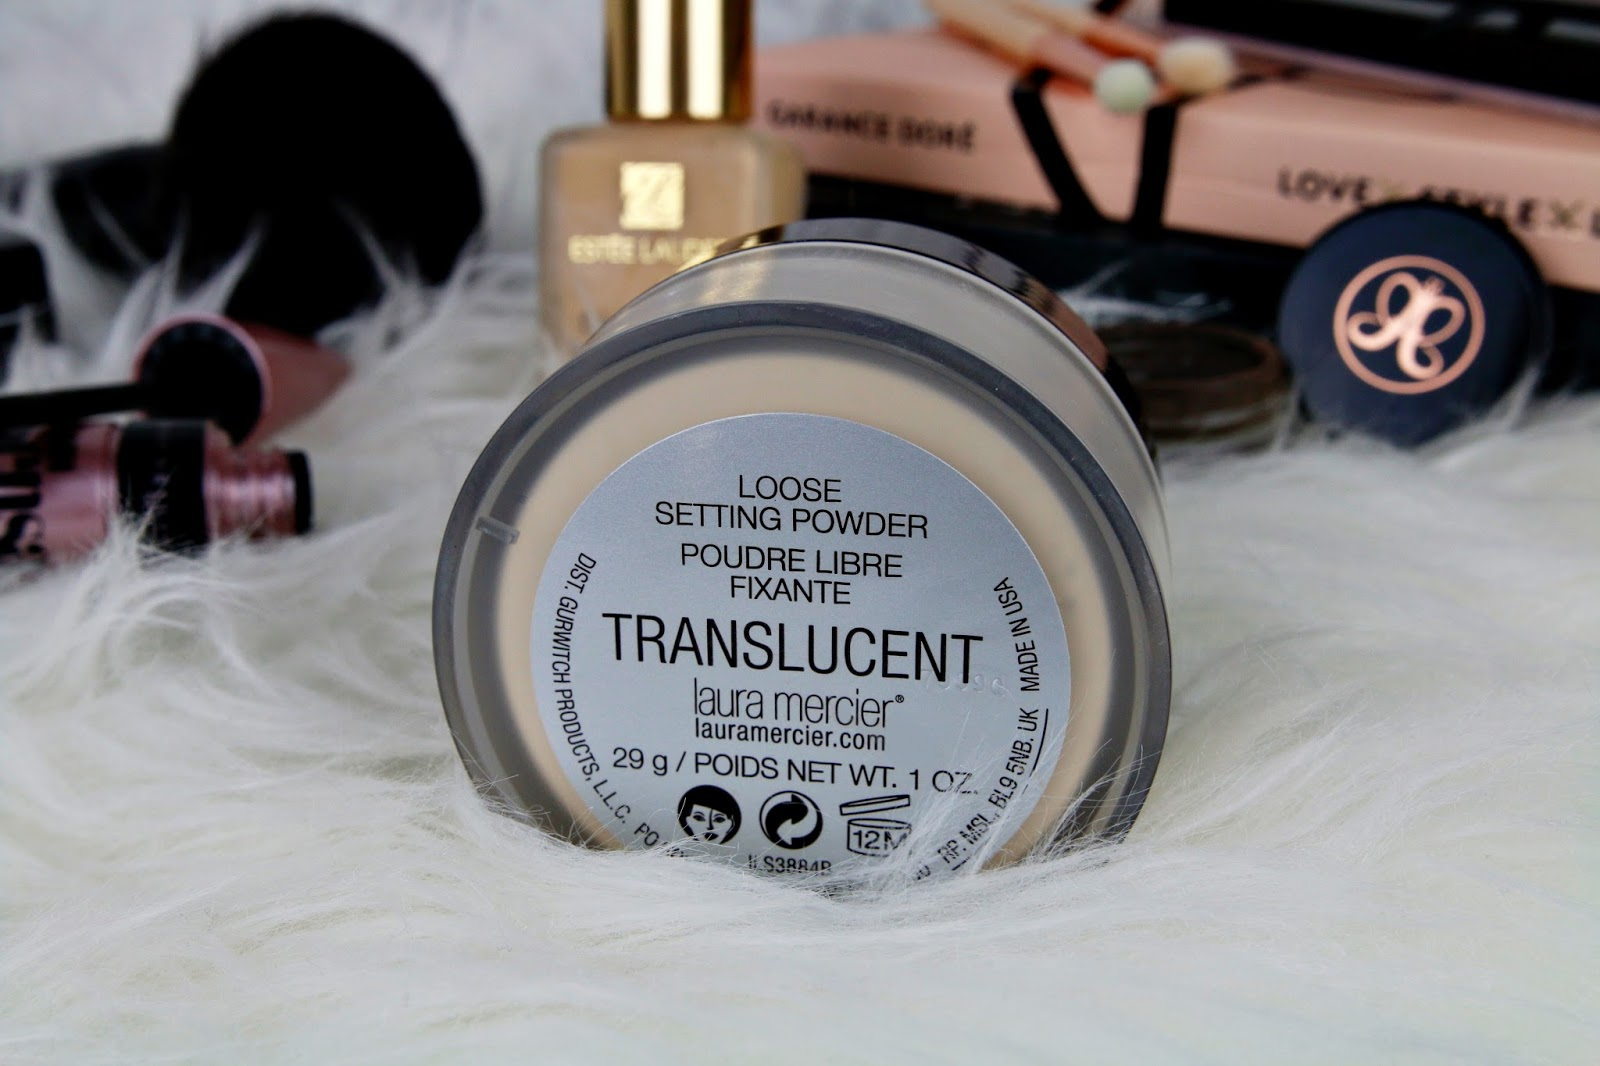 Laura Mercier Translucent Loose Setting Powder recenzja